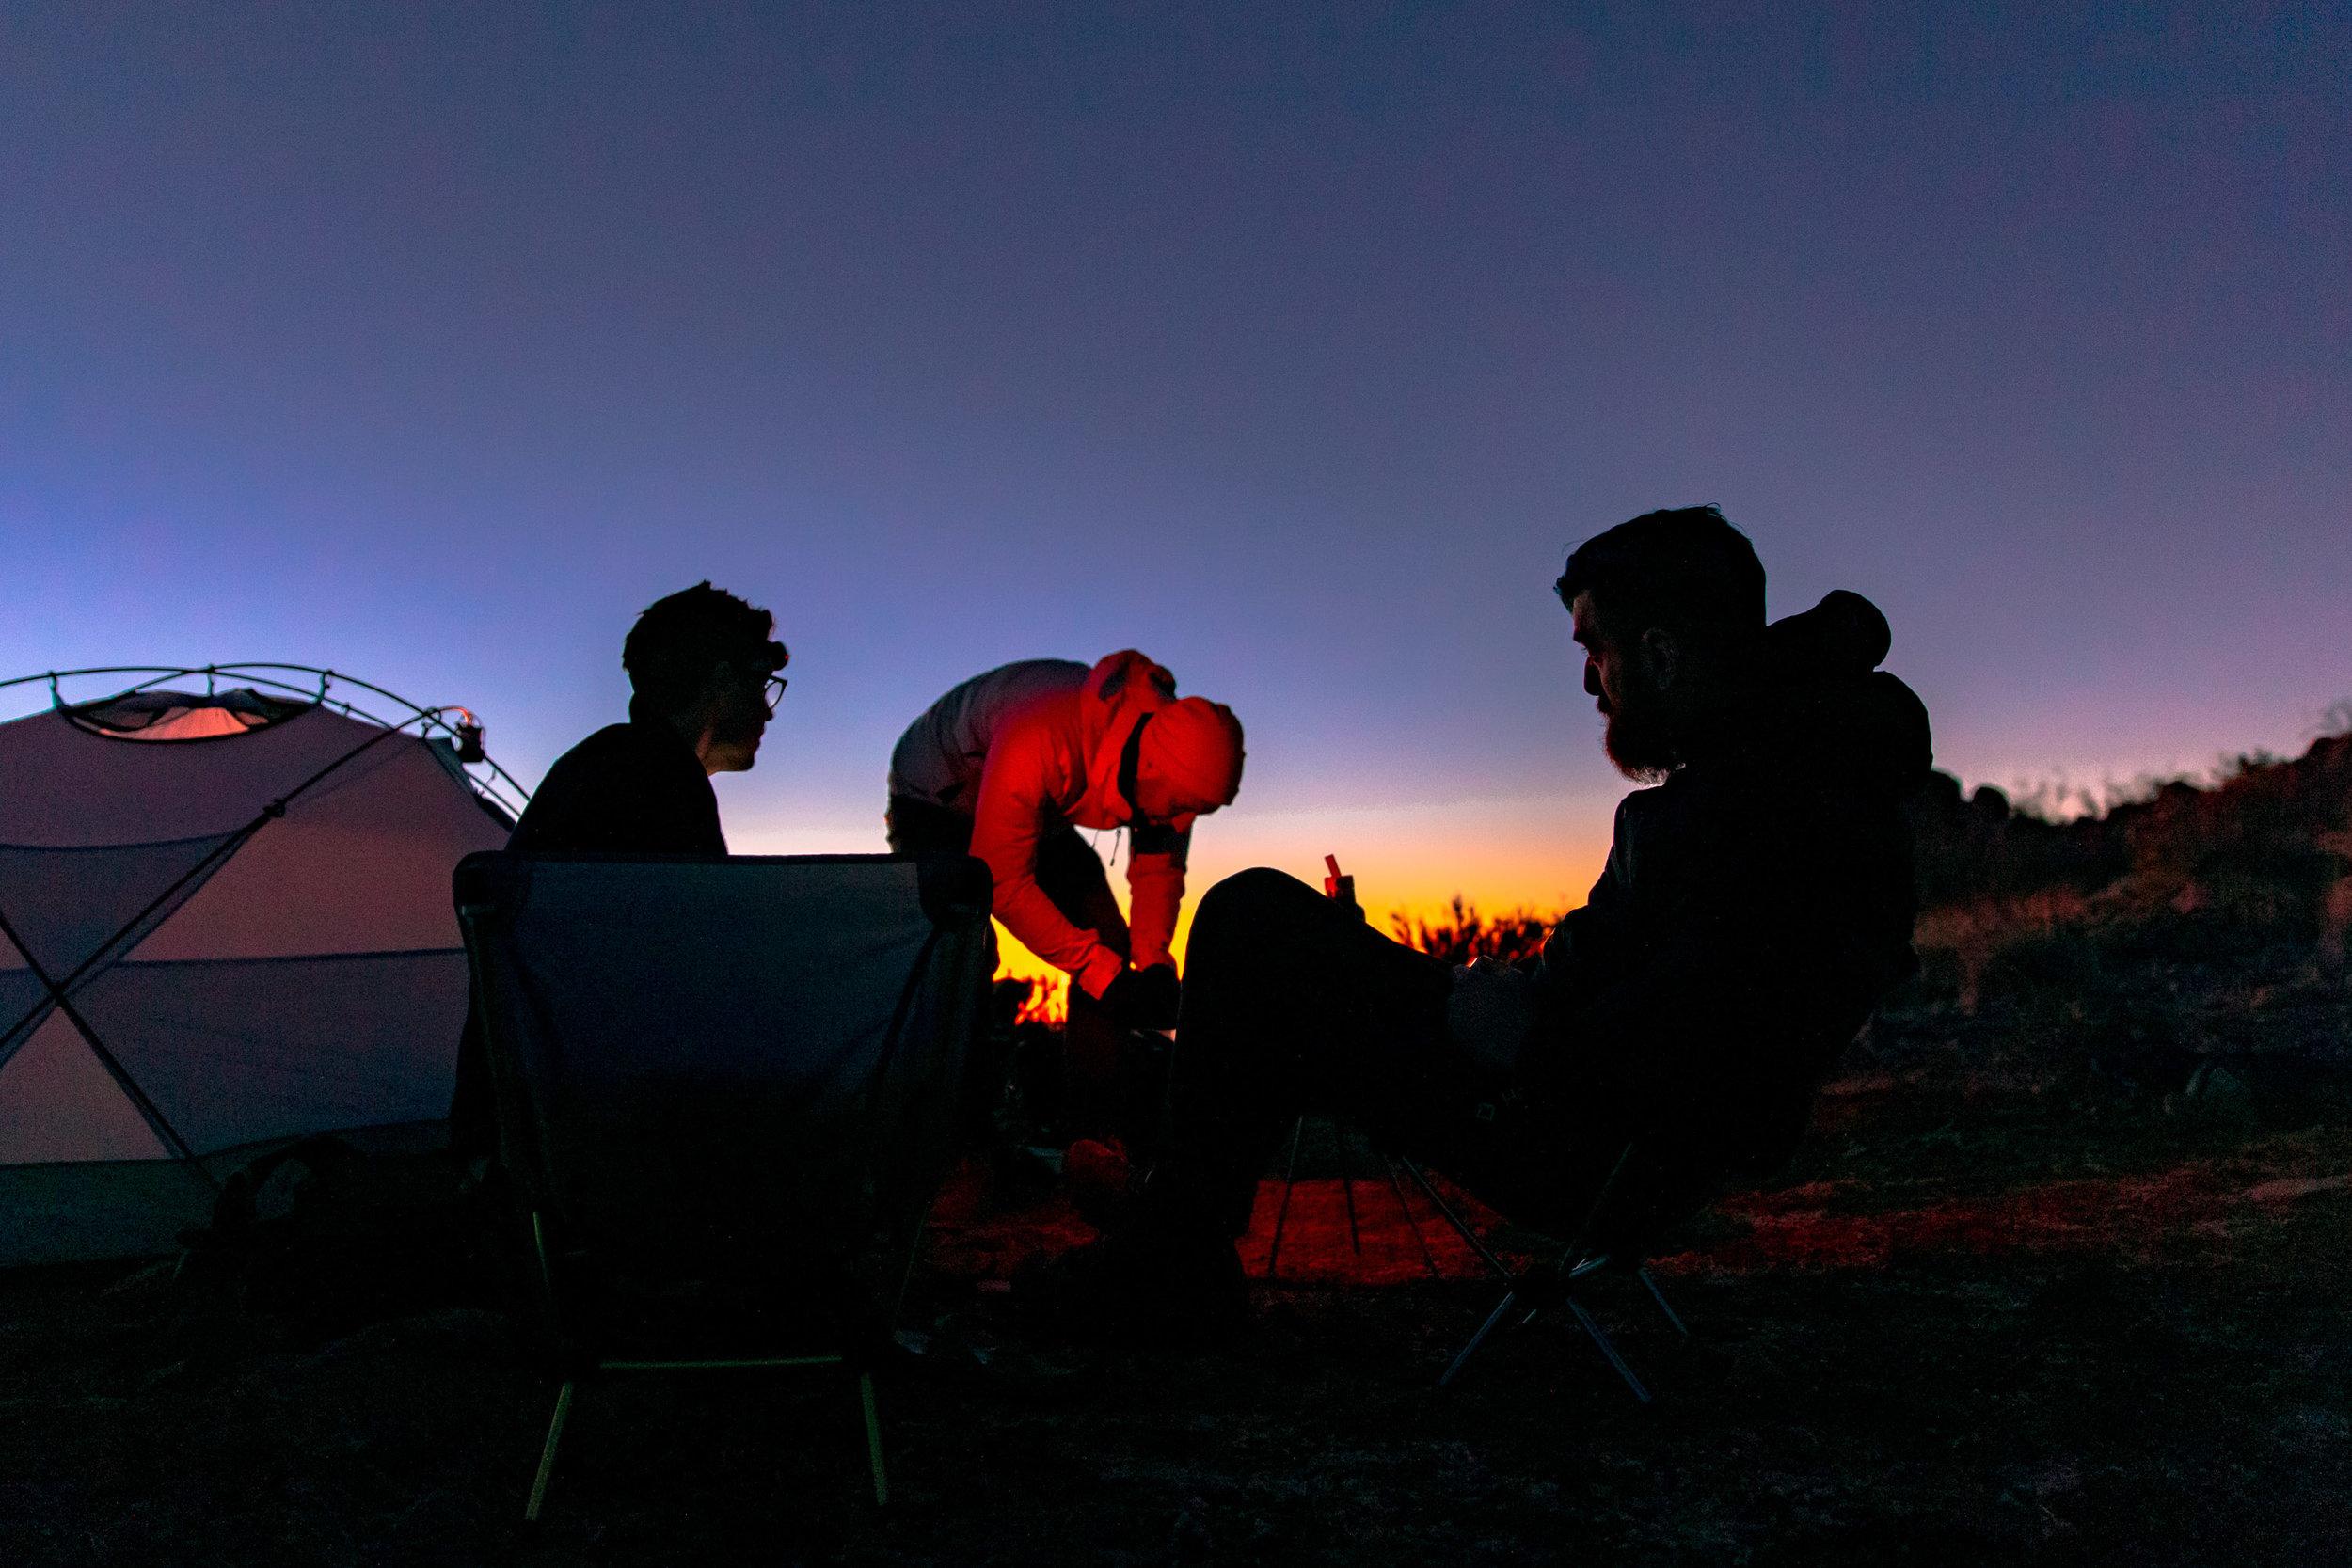 evanbdudley-Chile-Eclipse-19-0663.jpg